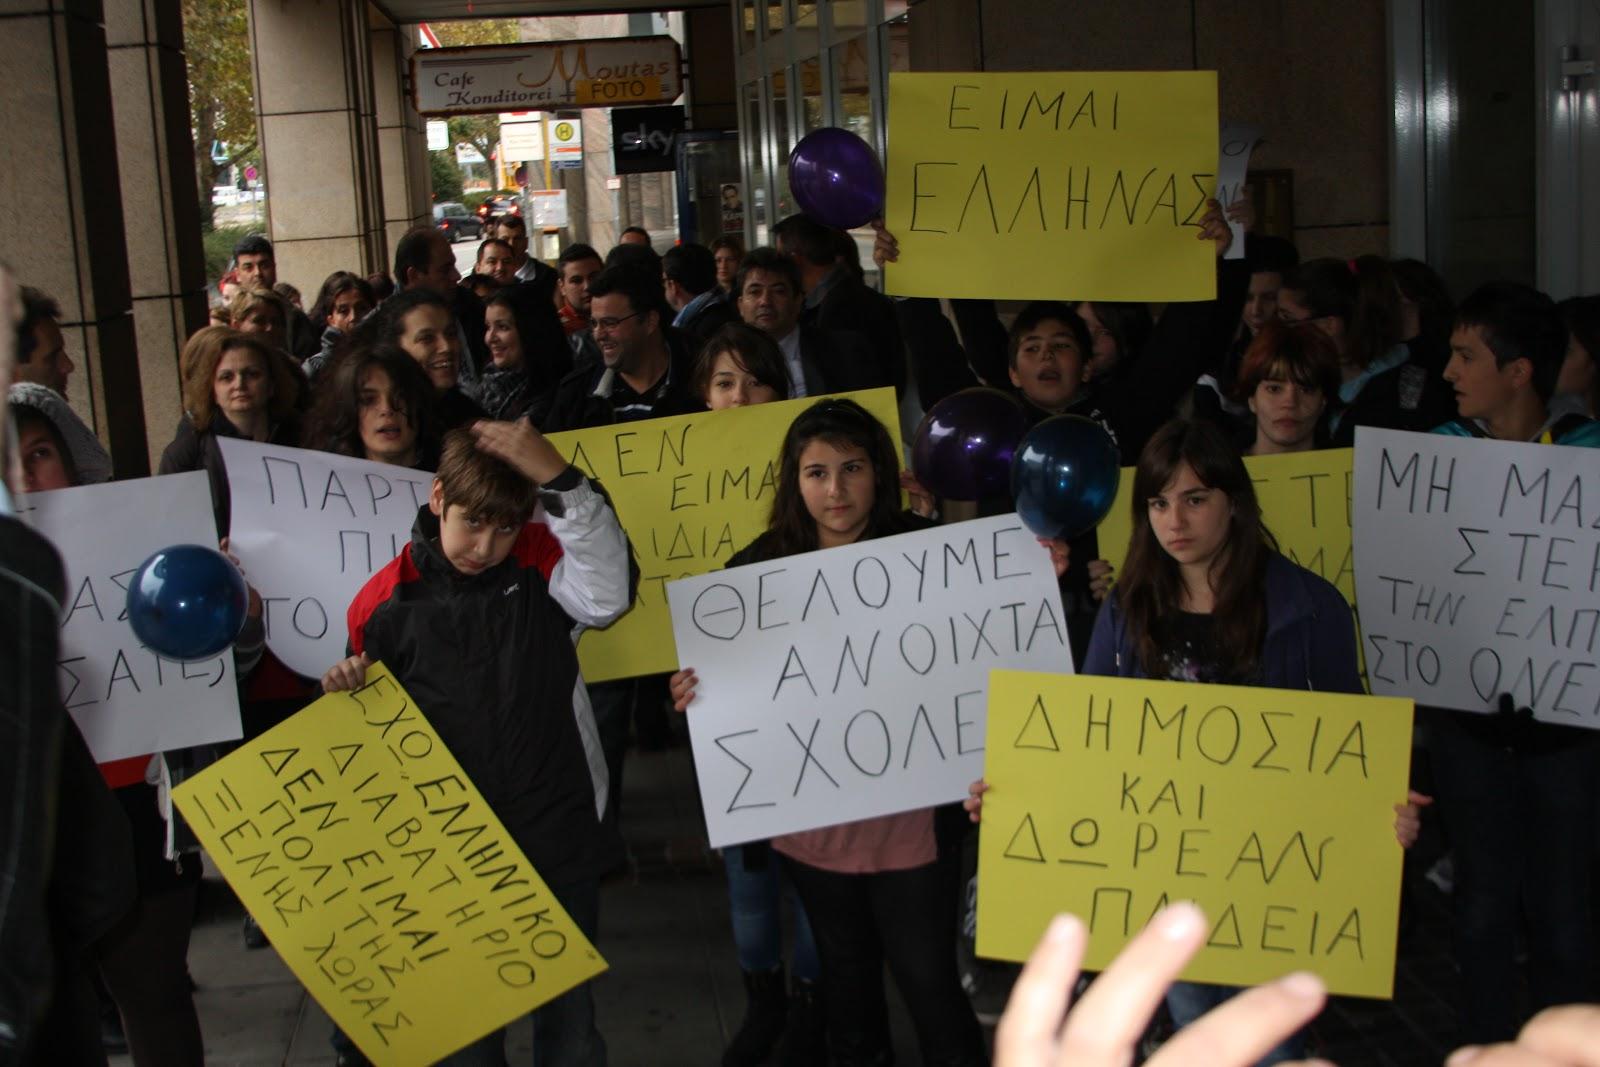 IMG 8901 Διαμαρτυρία Μαθητών στο Προξενείο της Στουτγάρδης